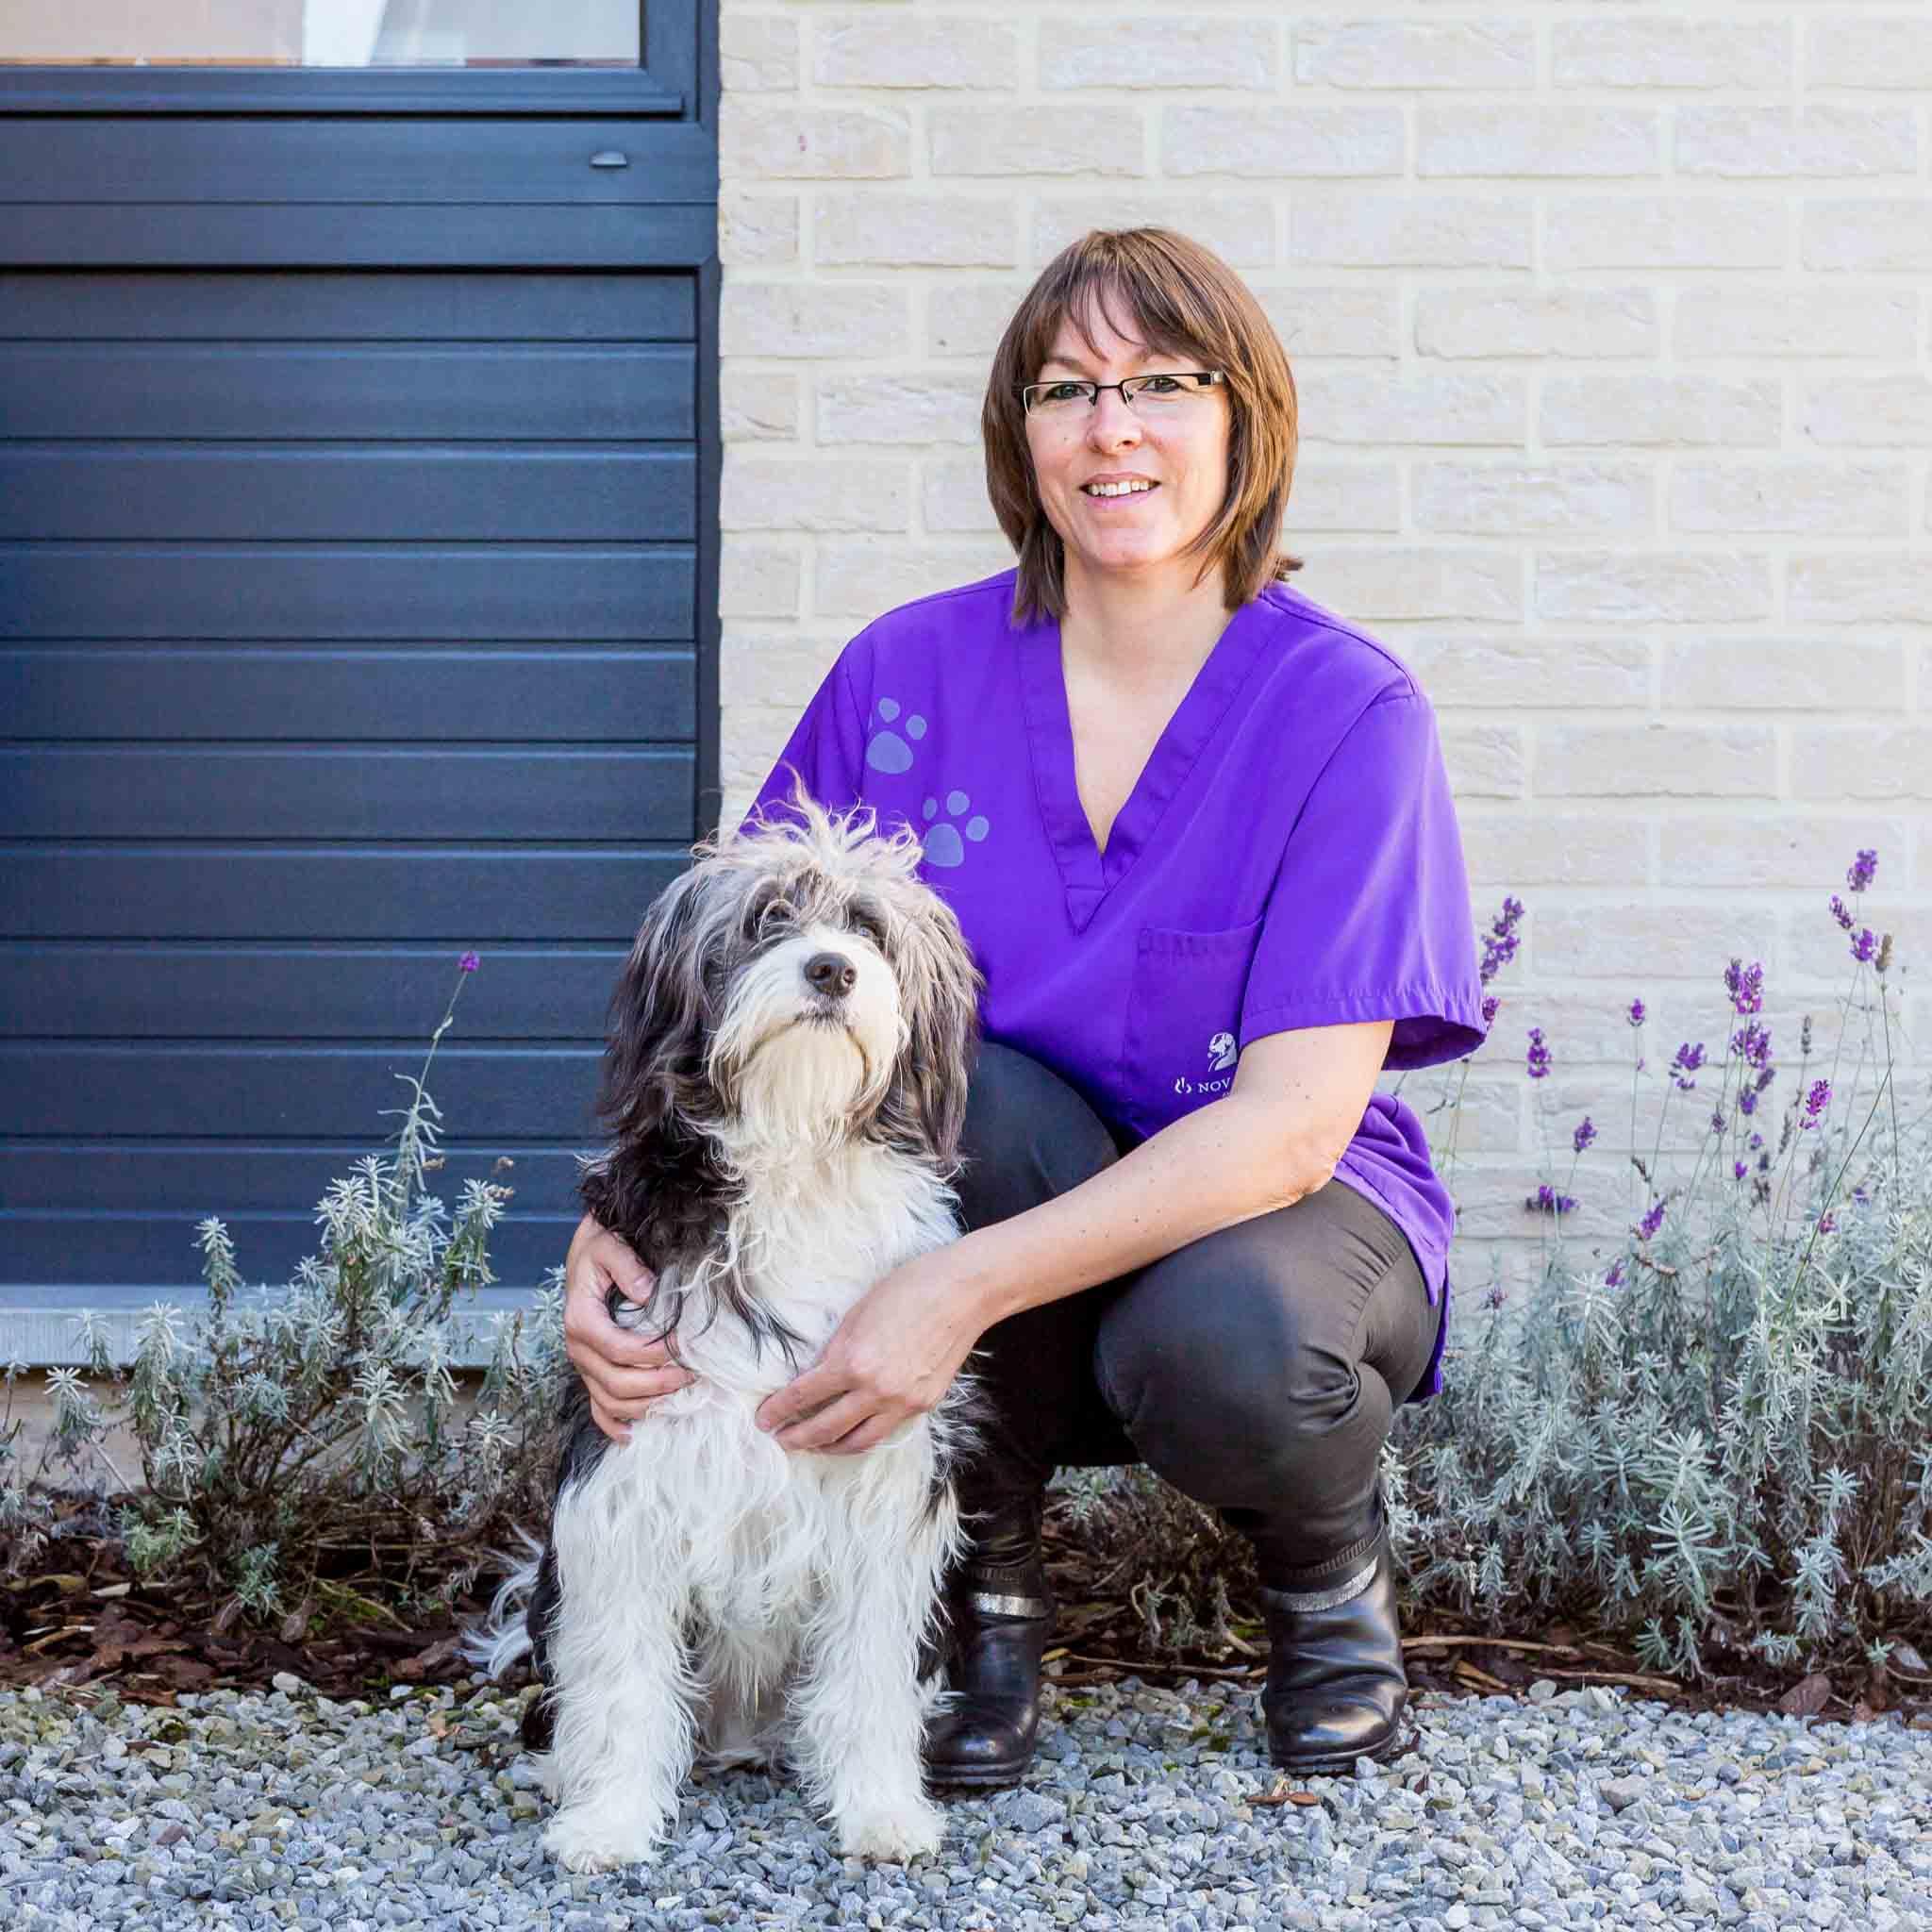 veterinaires_pirard_bourtembourg-internet-115